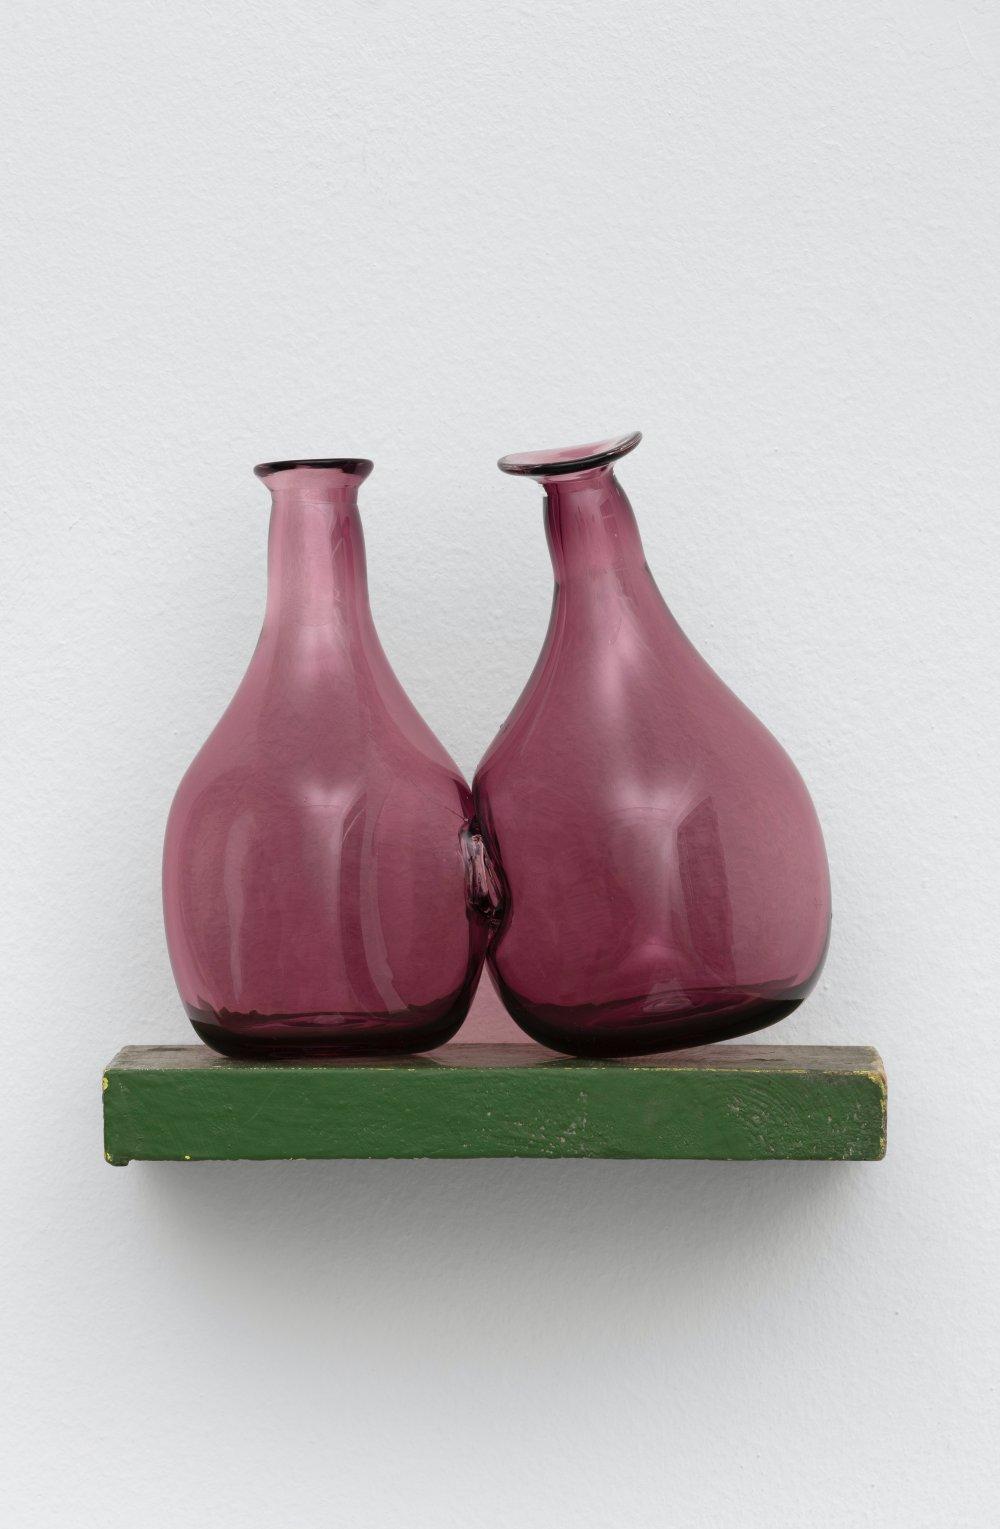 Kissing Vessels